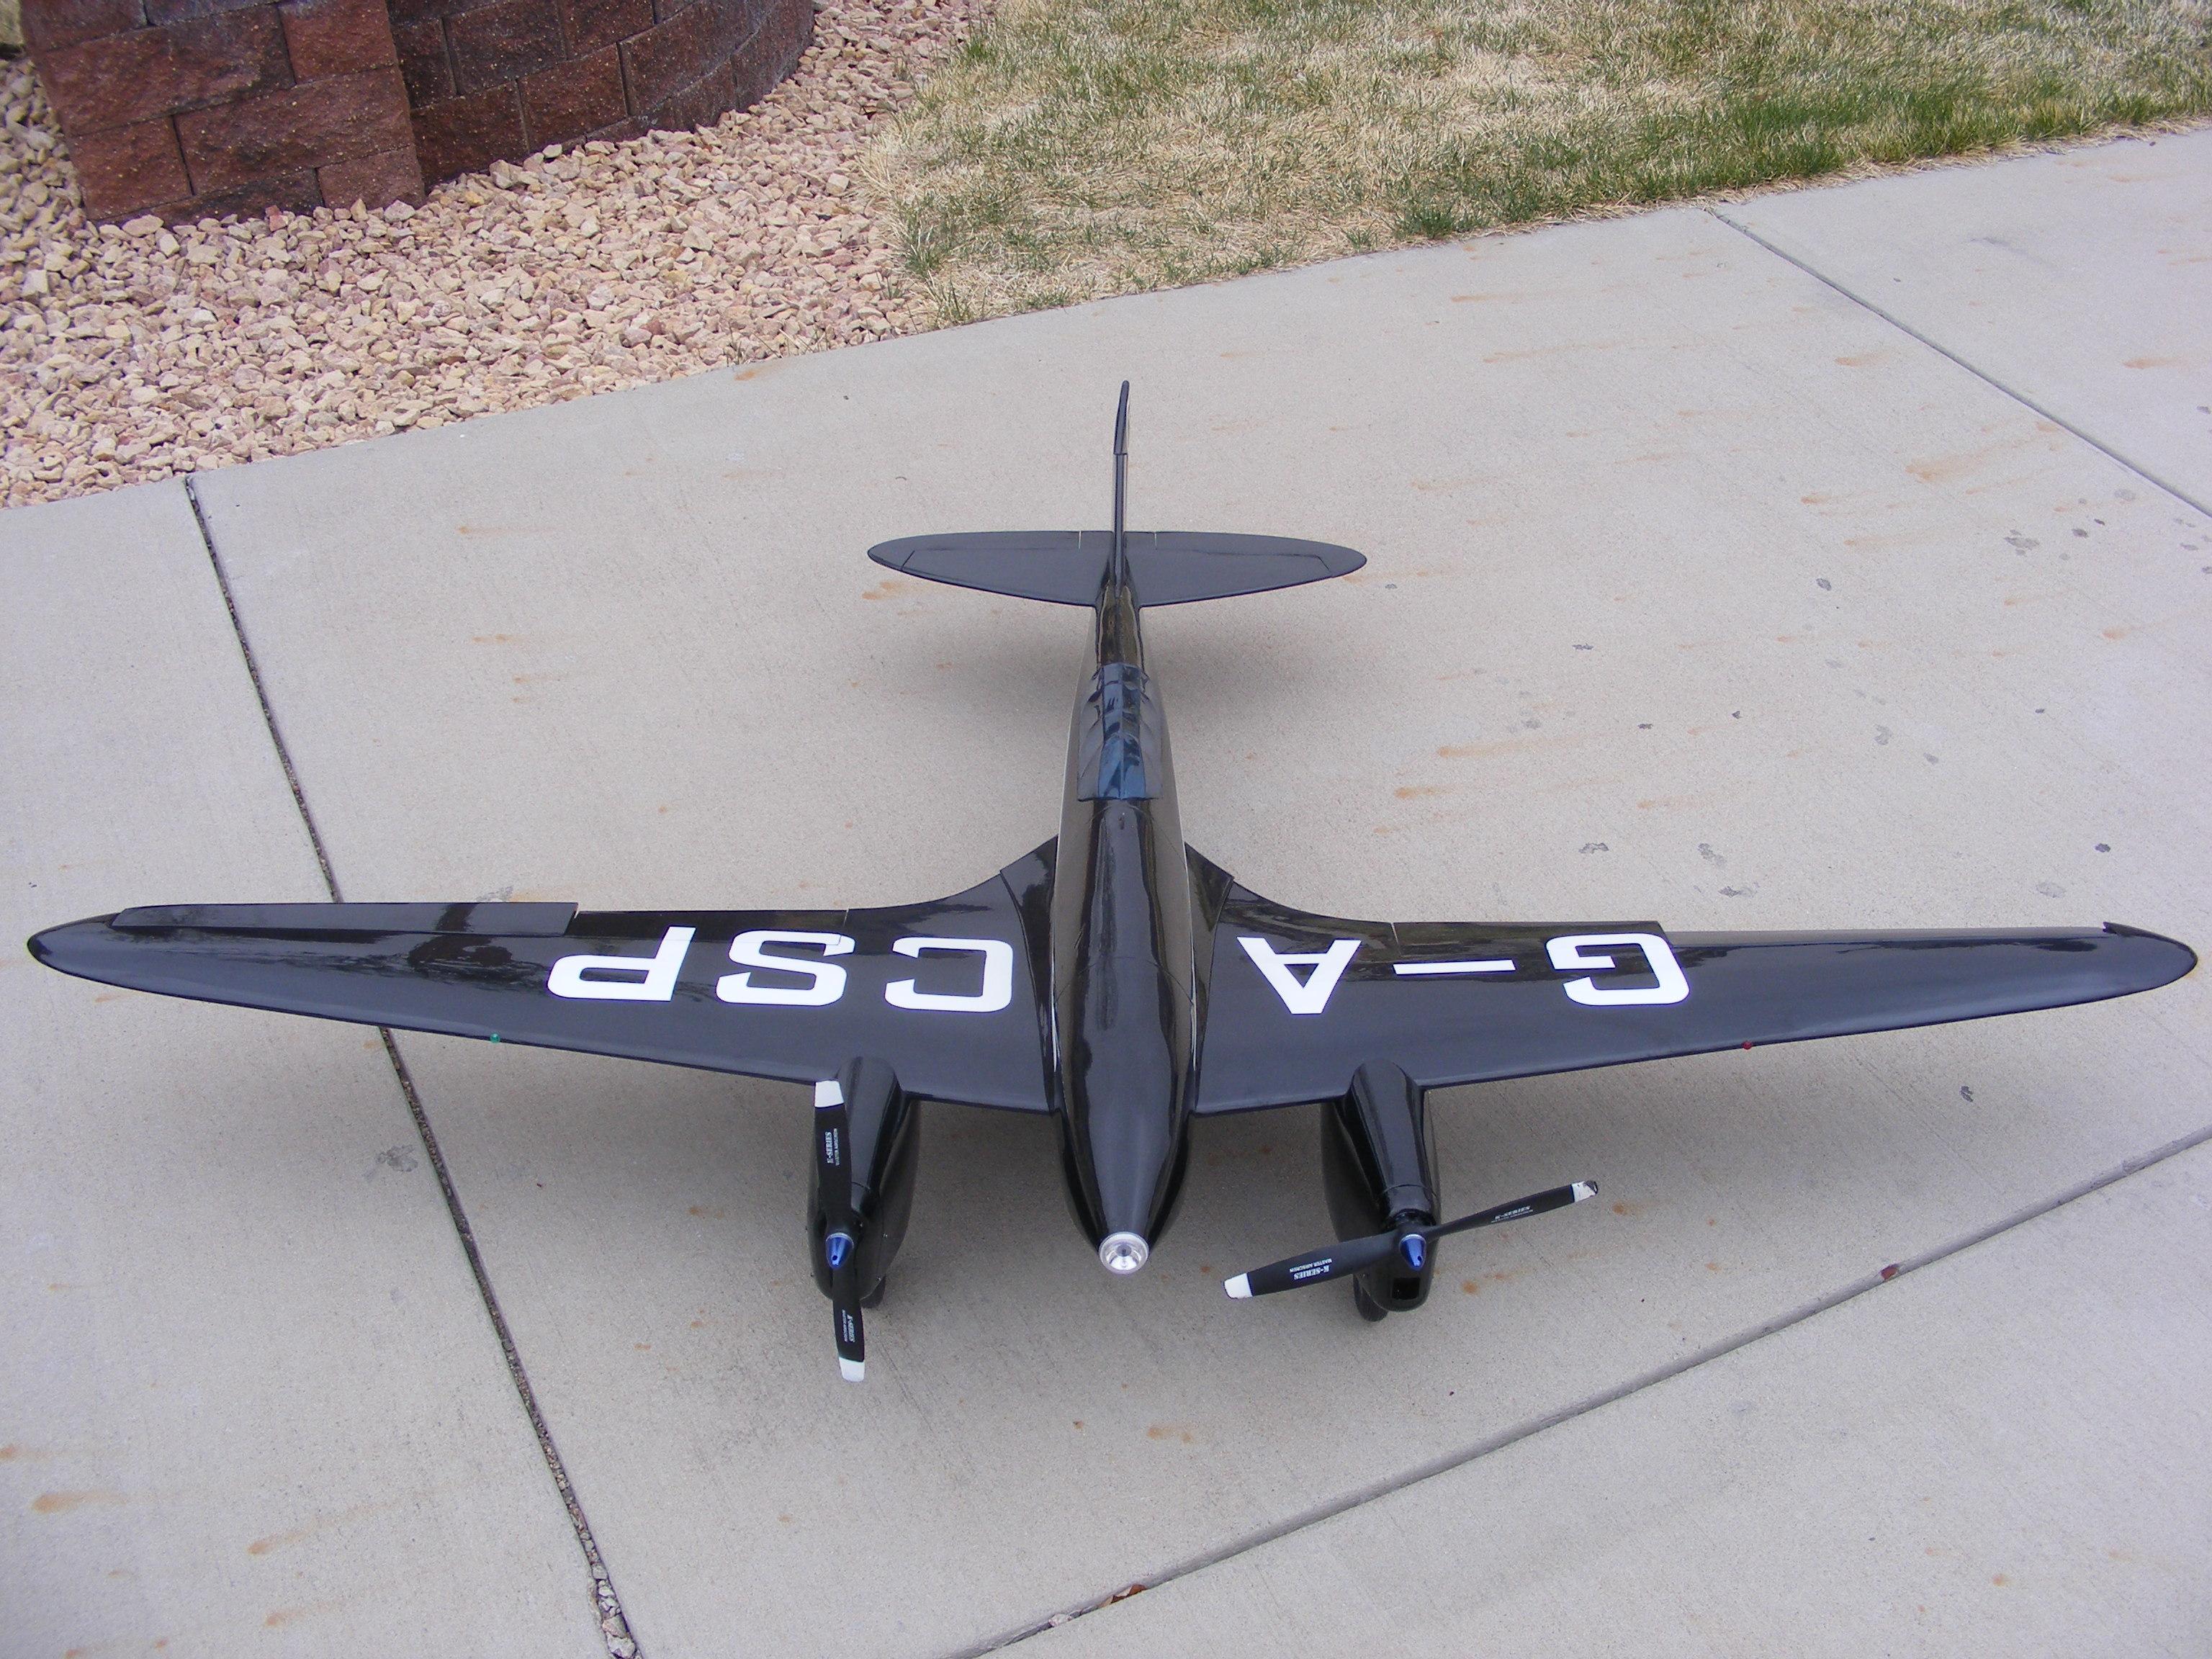 De Havilland DH 88 Comet Full Build Part II